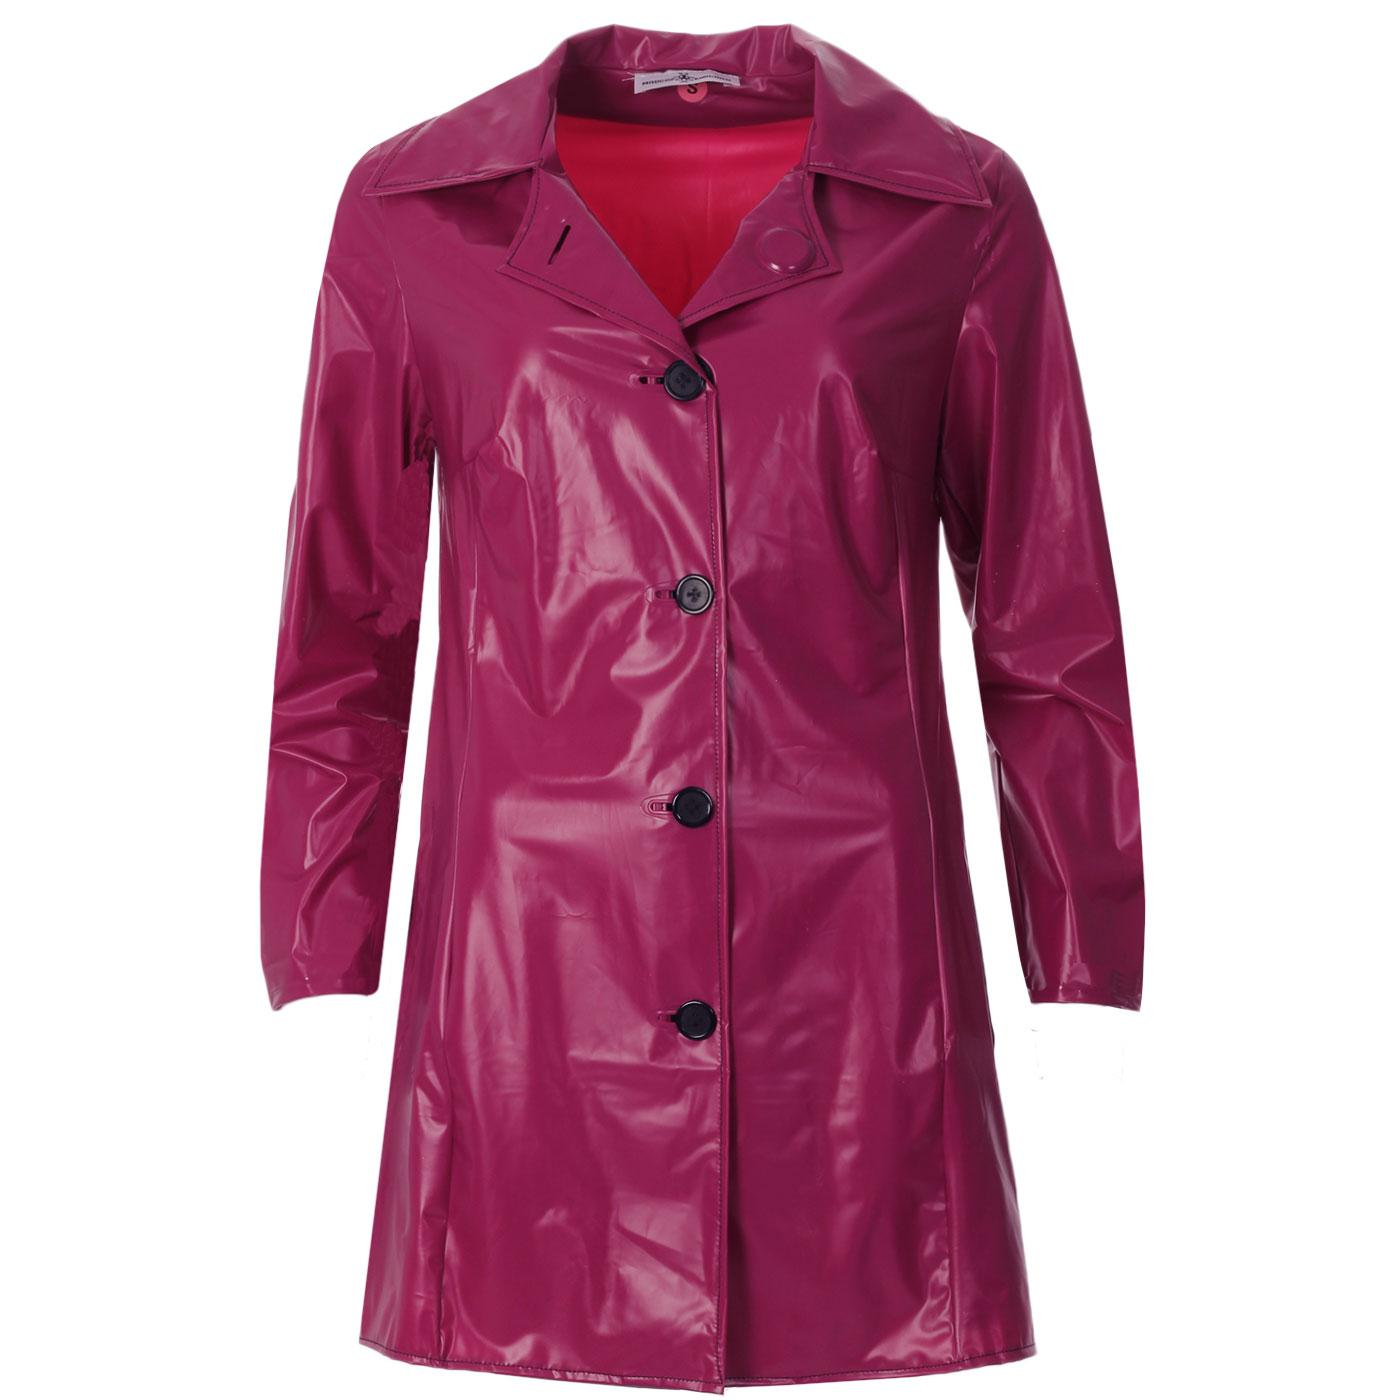 Jackie MADCAP Made in England Retro 60s Raincoat M